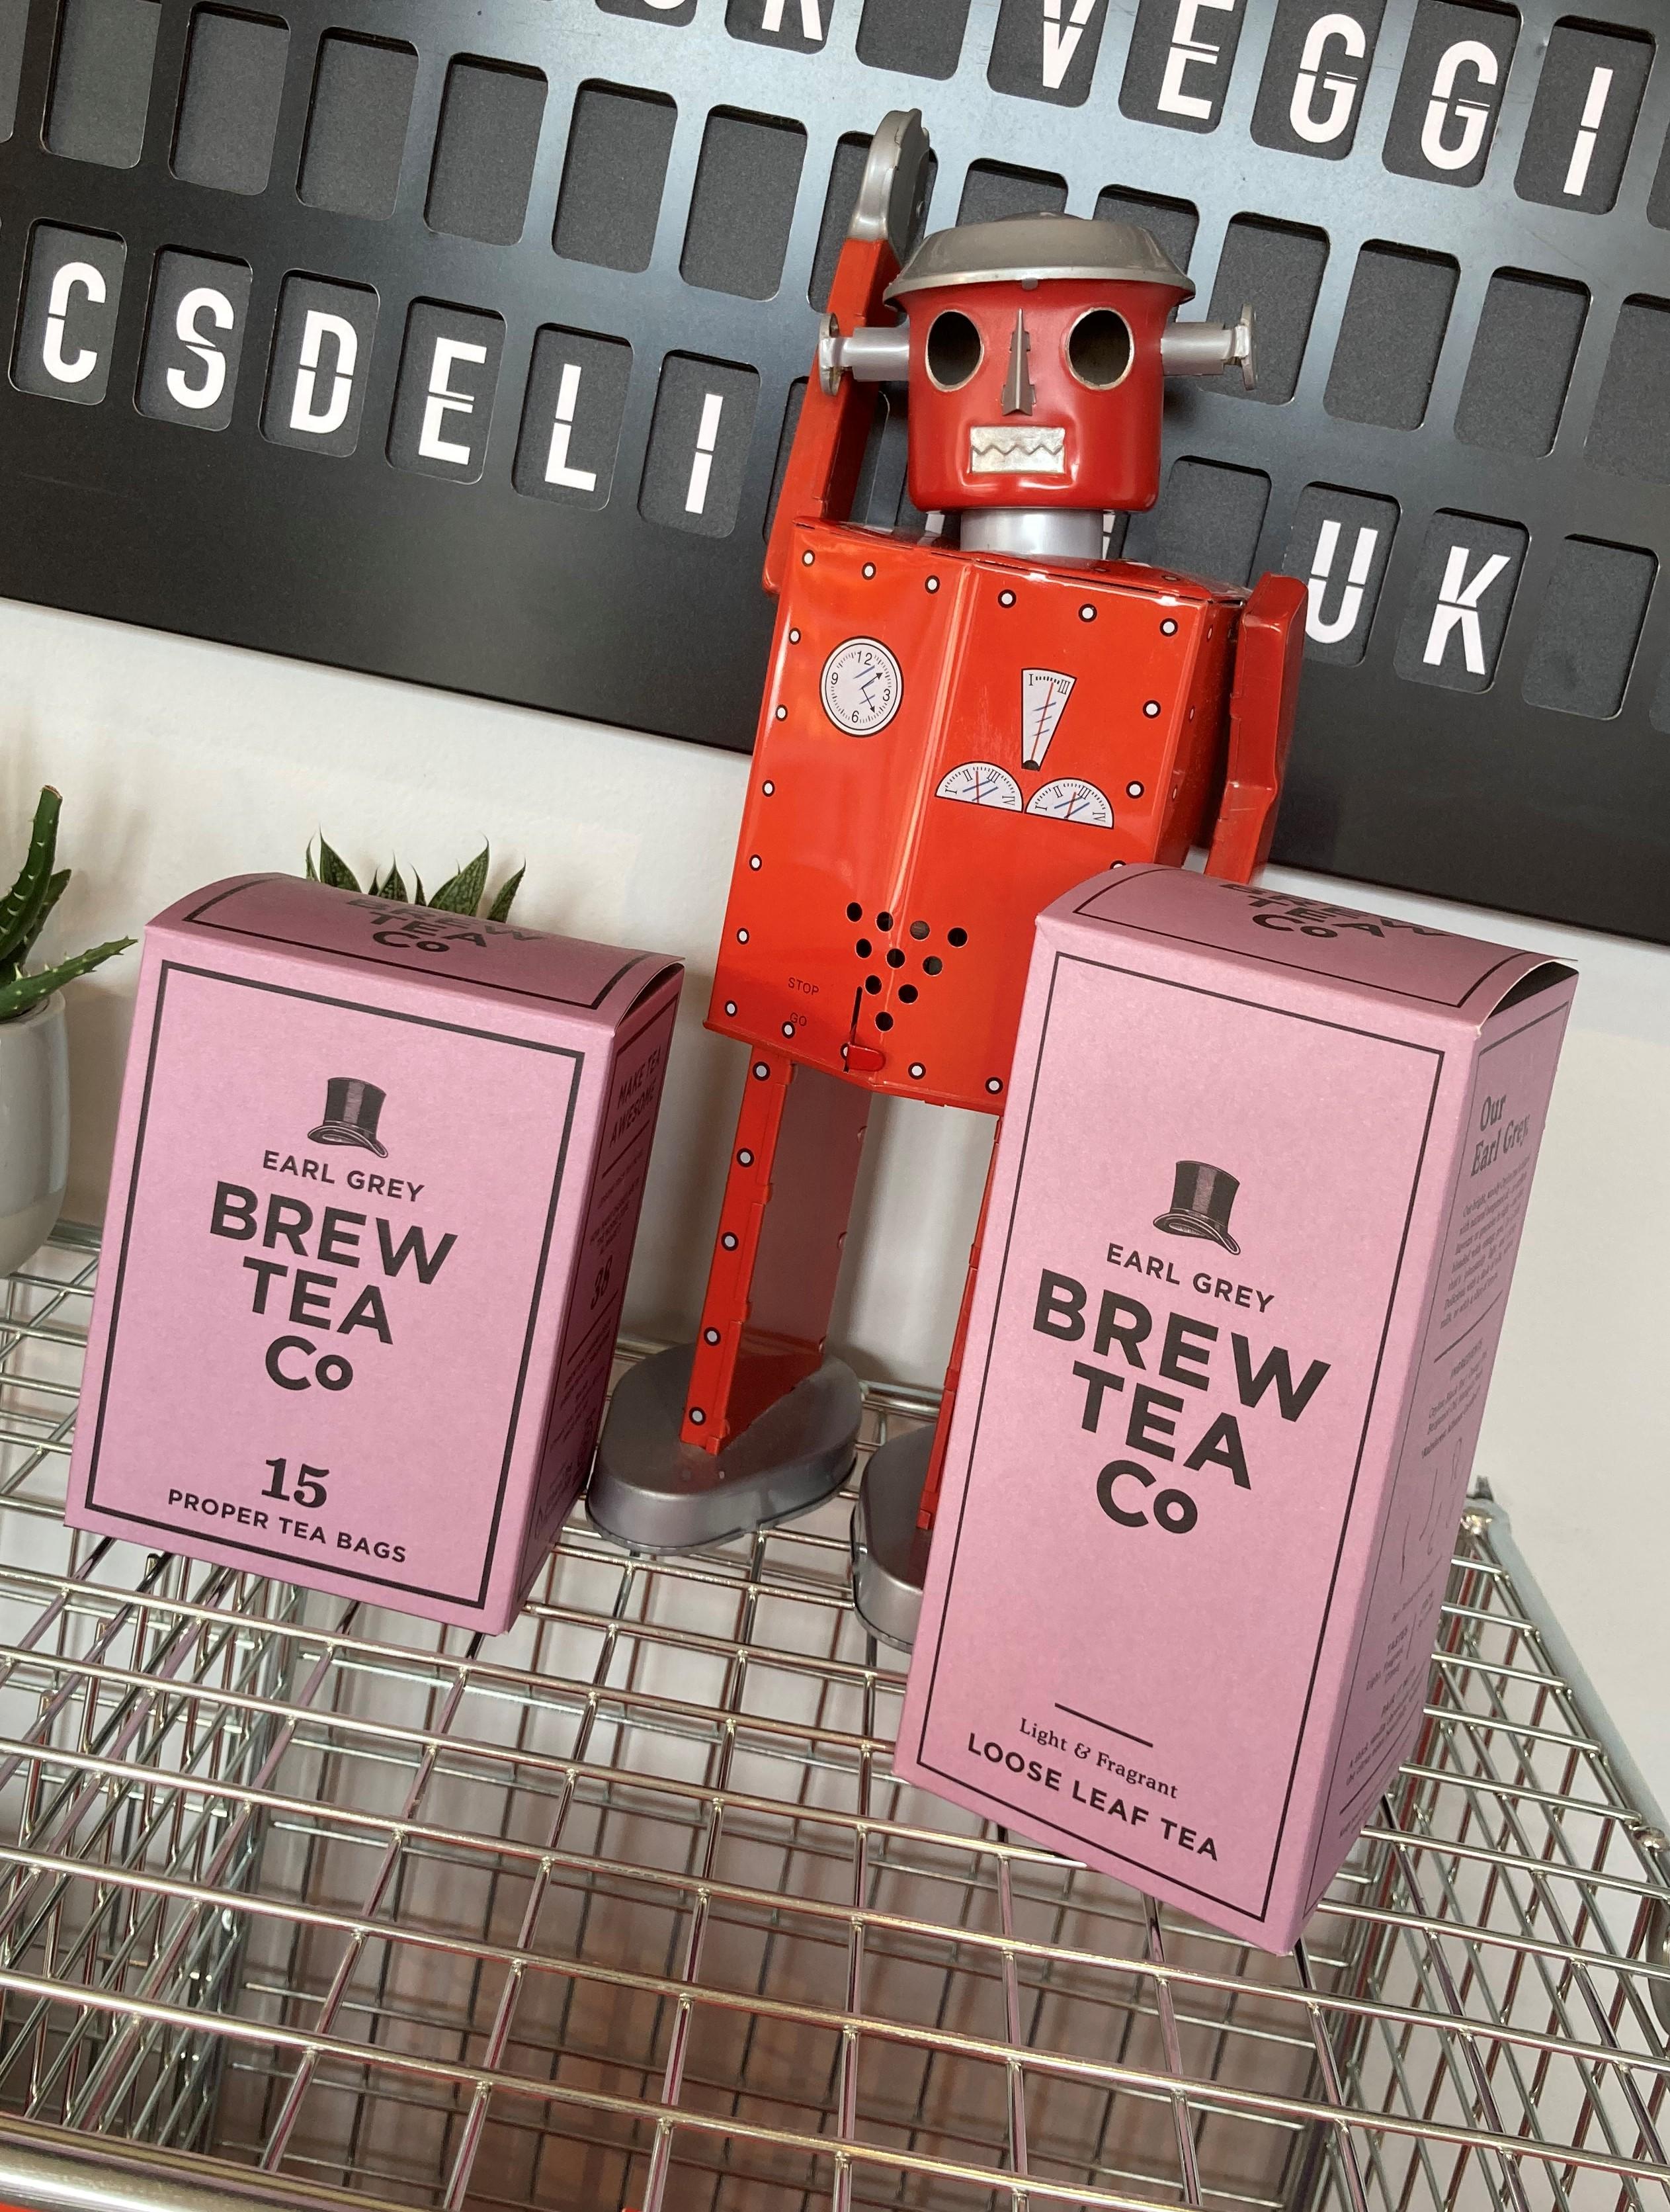 Brew Tea Co Earl Grey - 1/4lb Loose Leaf